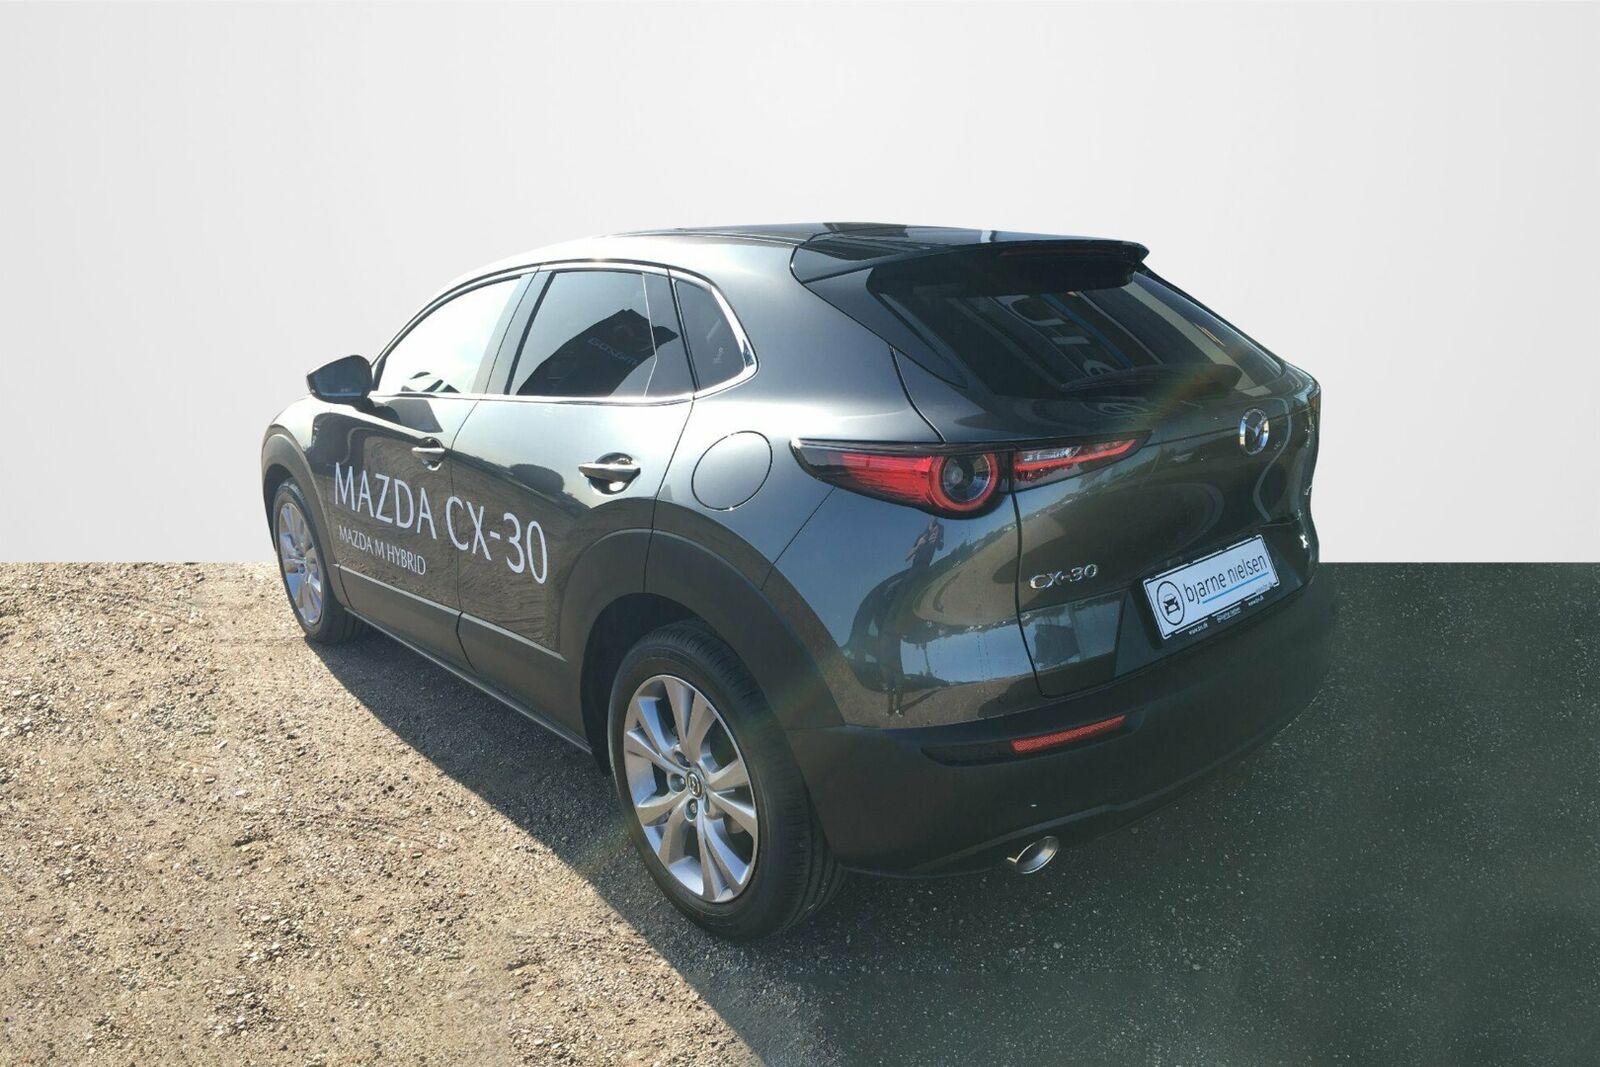 Mazda CX-30 2,0 SkyActiv-X 180 Cosmo aut. - billede 3